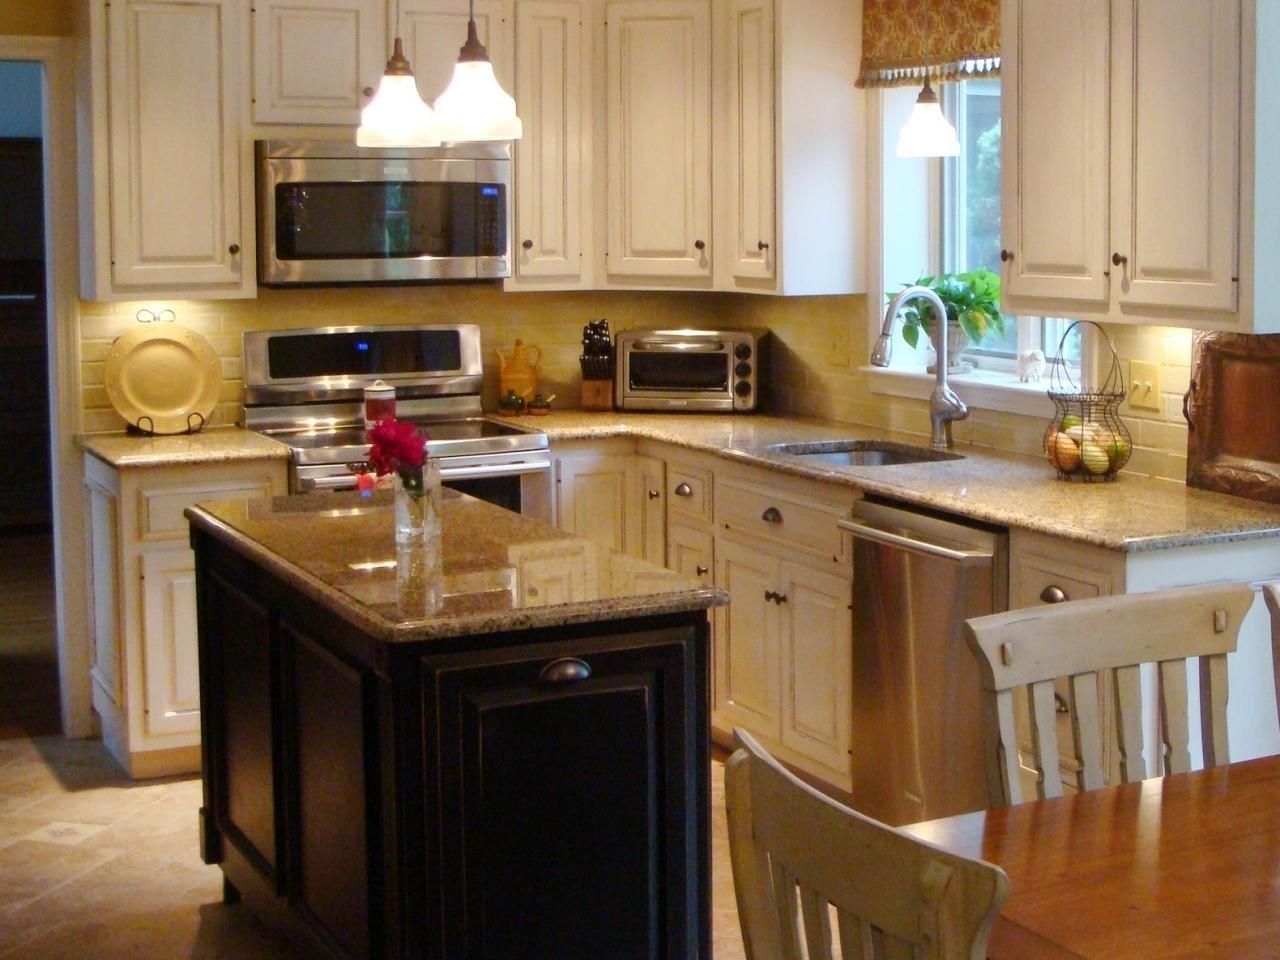 10 Fashionable Kitchen Layout Ideas With Island small kitchen design ideas with island kitchen and decor 2021